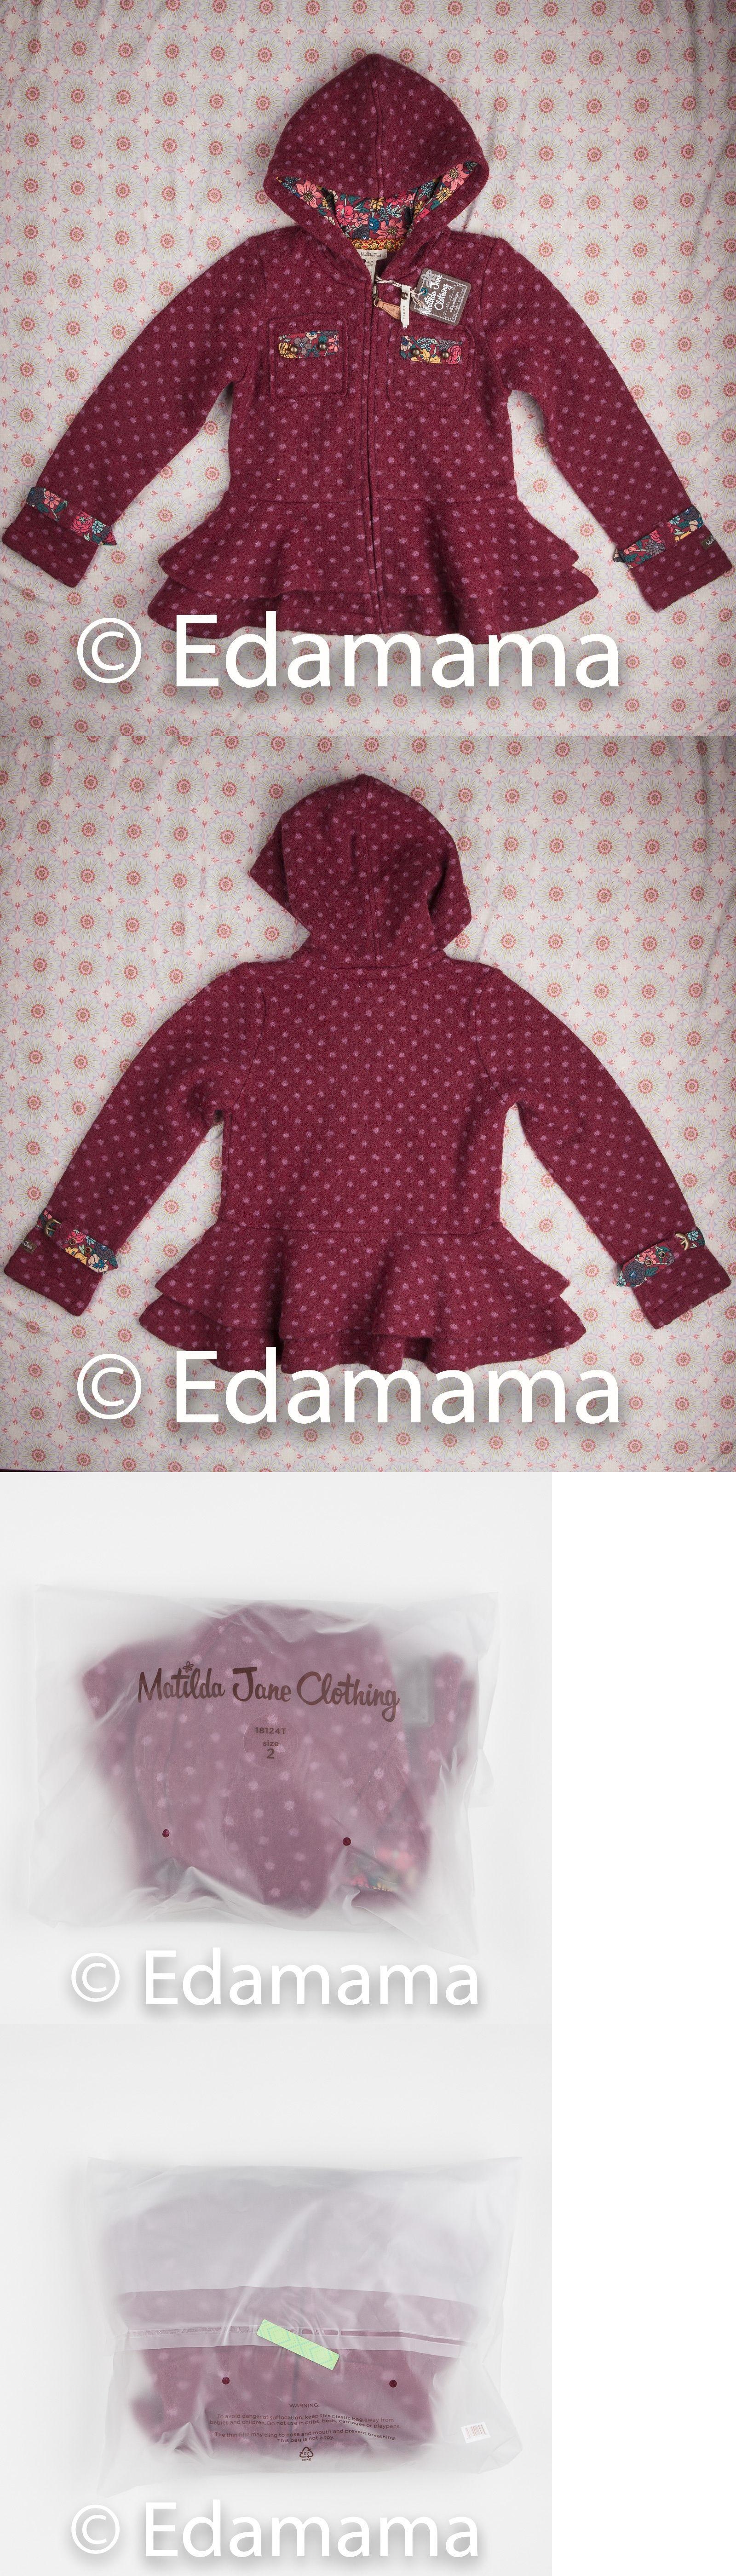 8efa5c7ff Outerwear 147202  Nwt Matilda Jane Devon Coat Friends Forever Girls ...